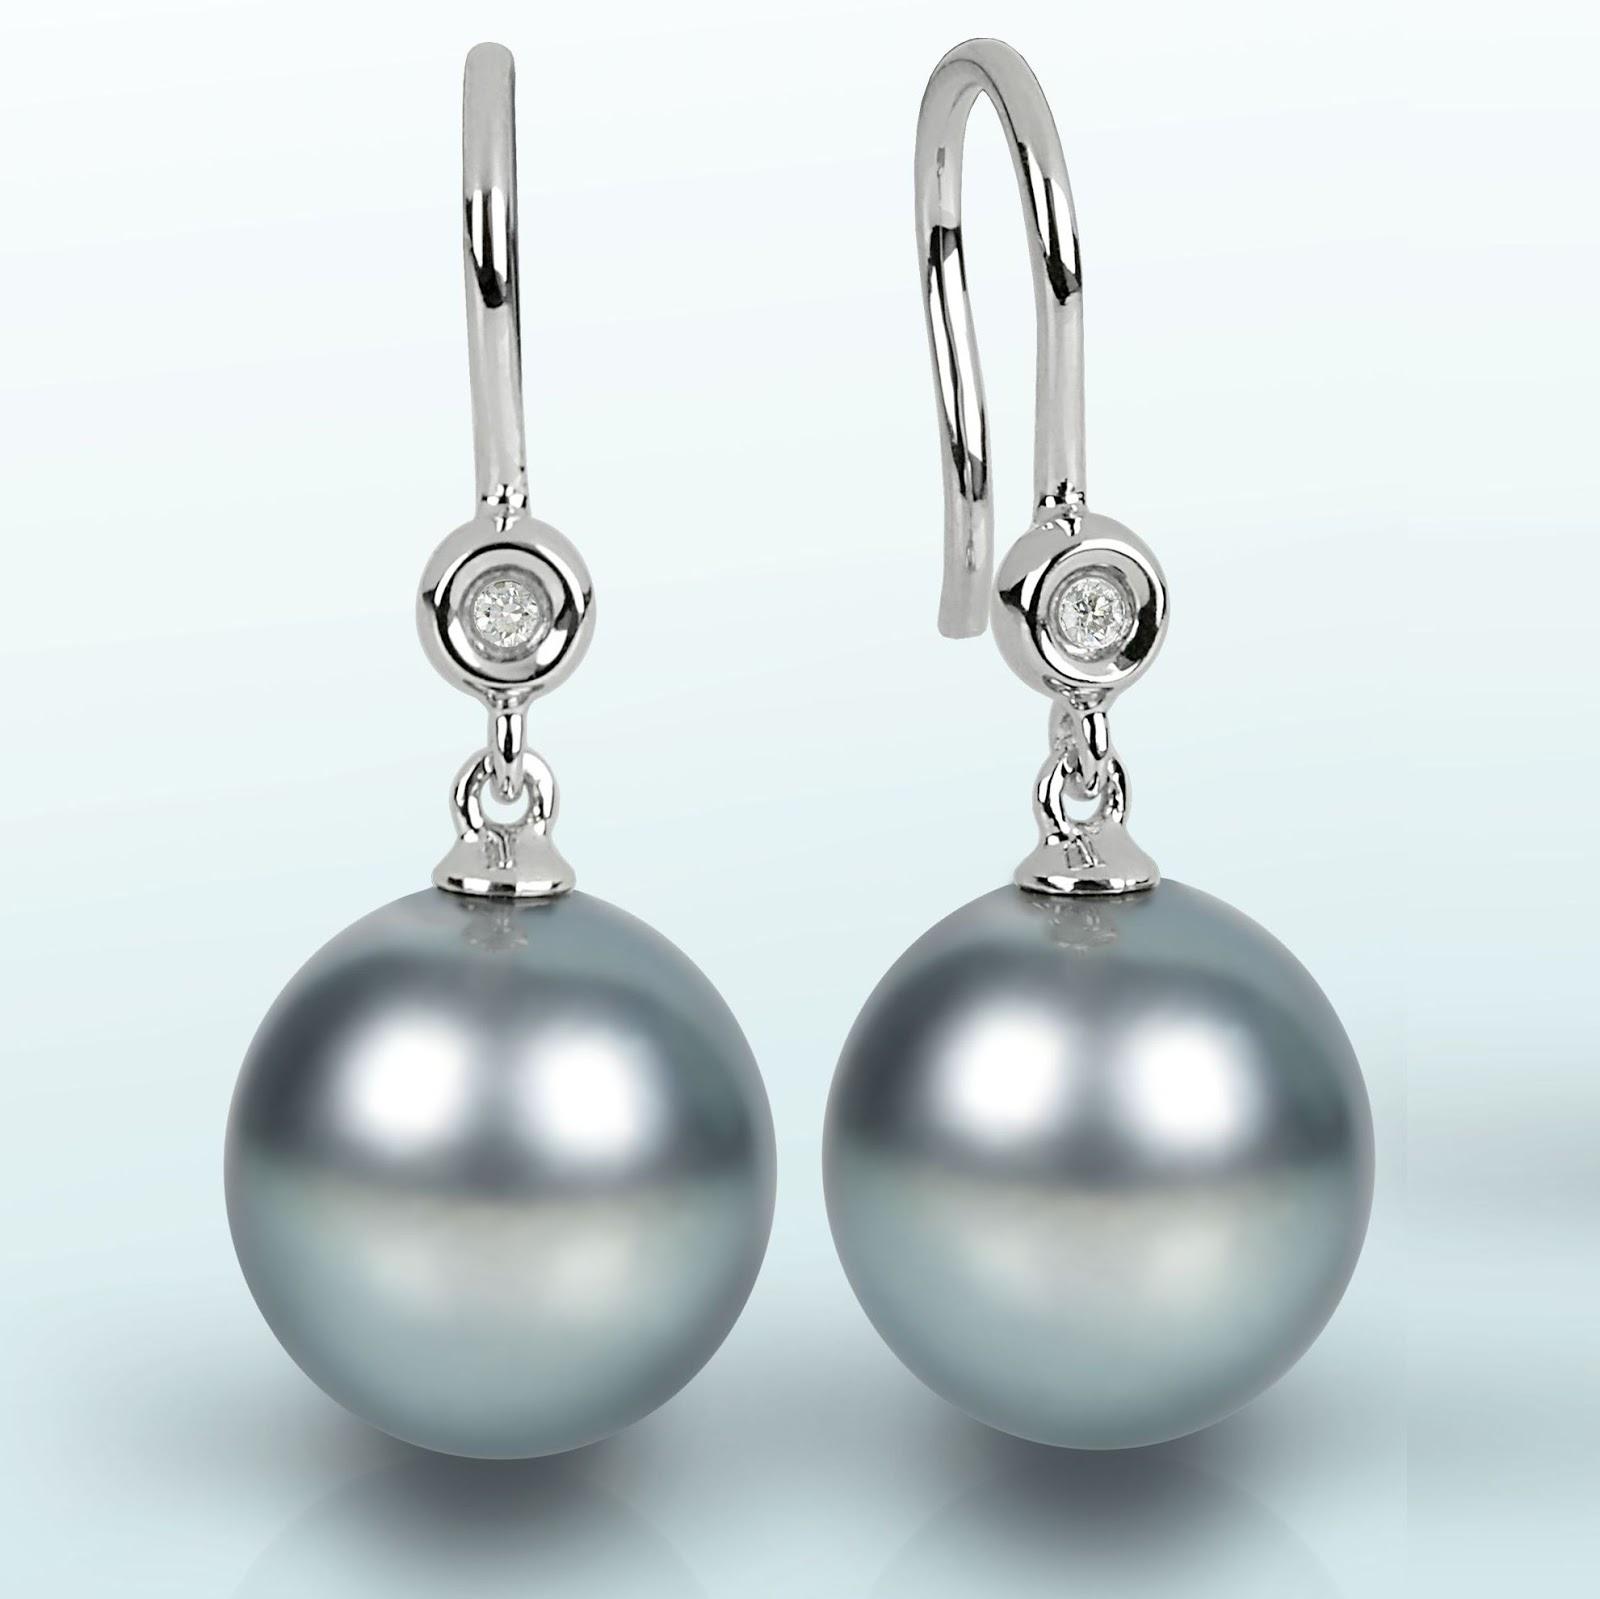 Tahiti Pearls Tahiti Perlen Tahiti Perlen aktuell 2015